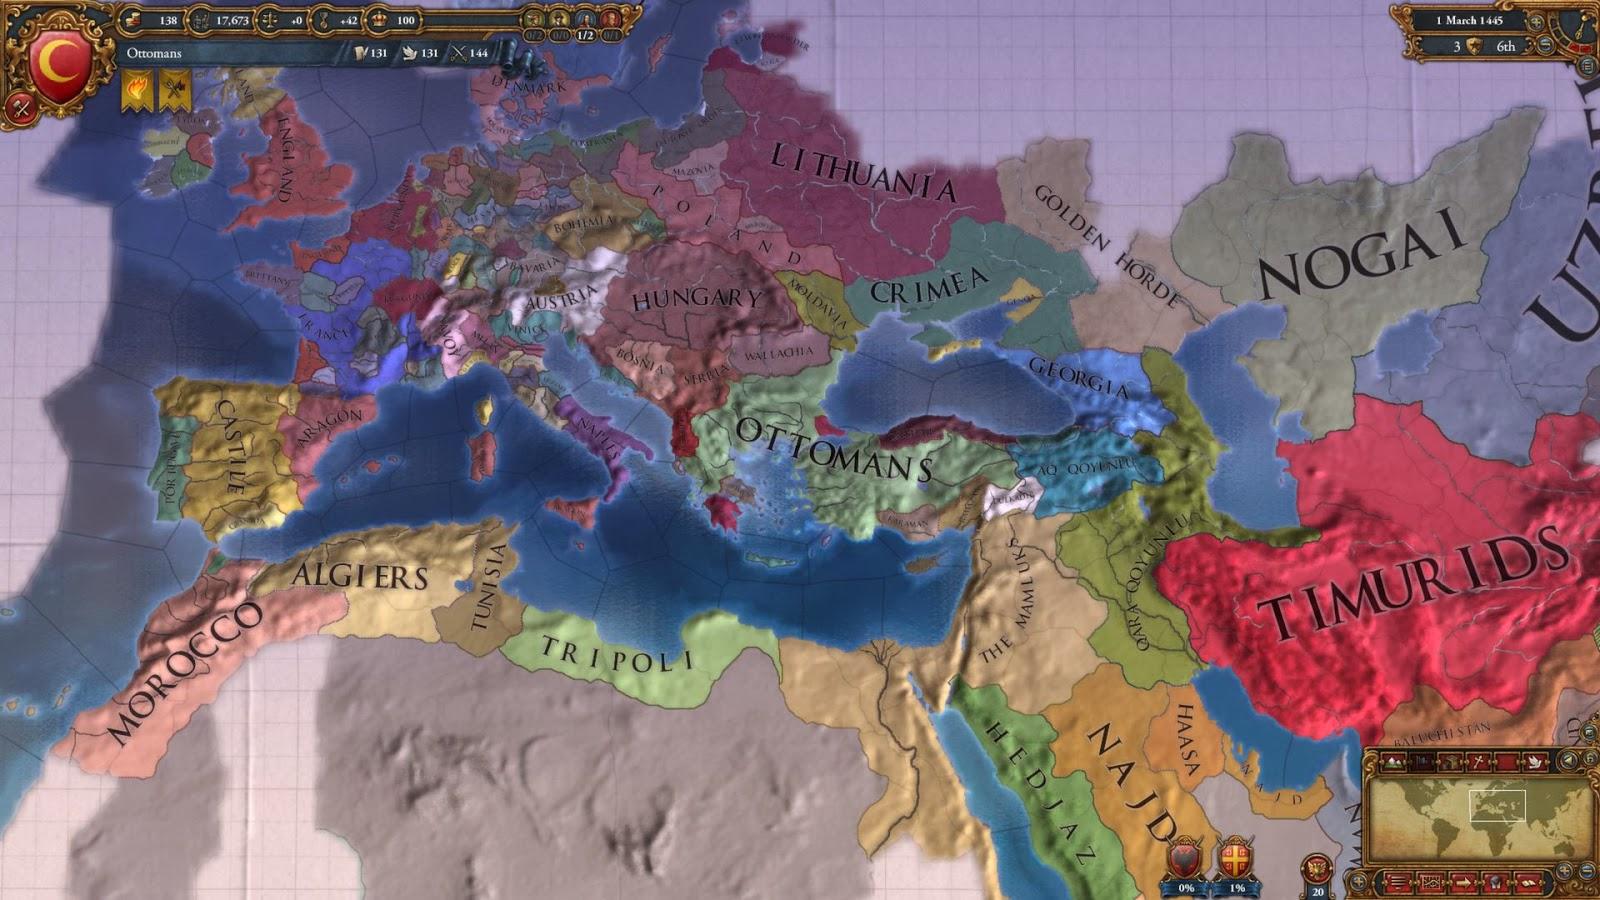 Europa universalis 4 дипломатическая репутация - 3f31